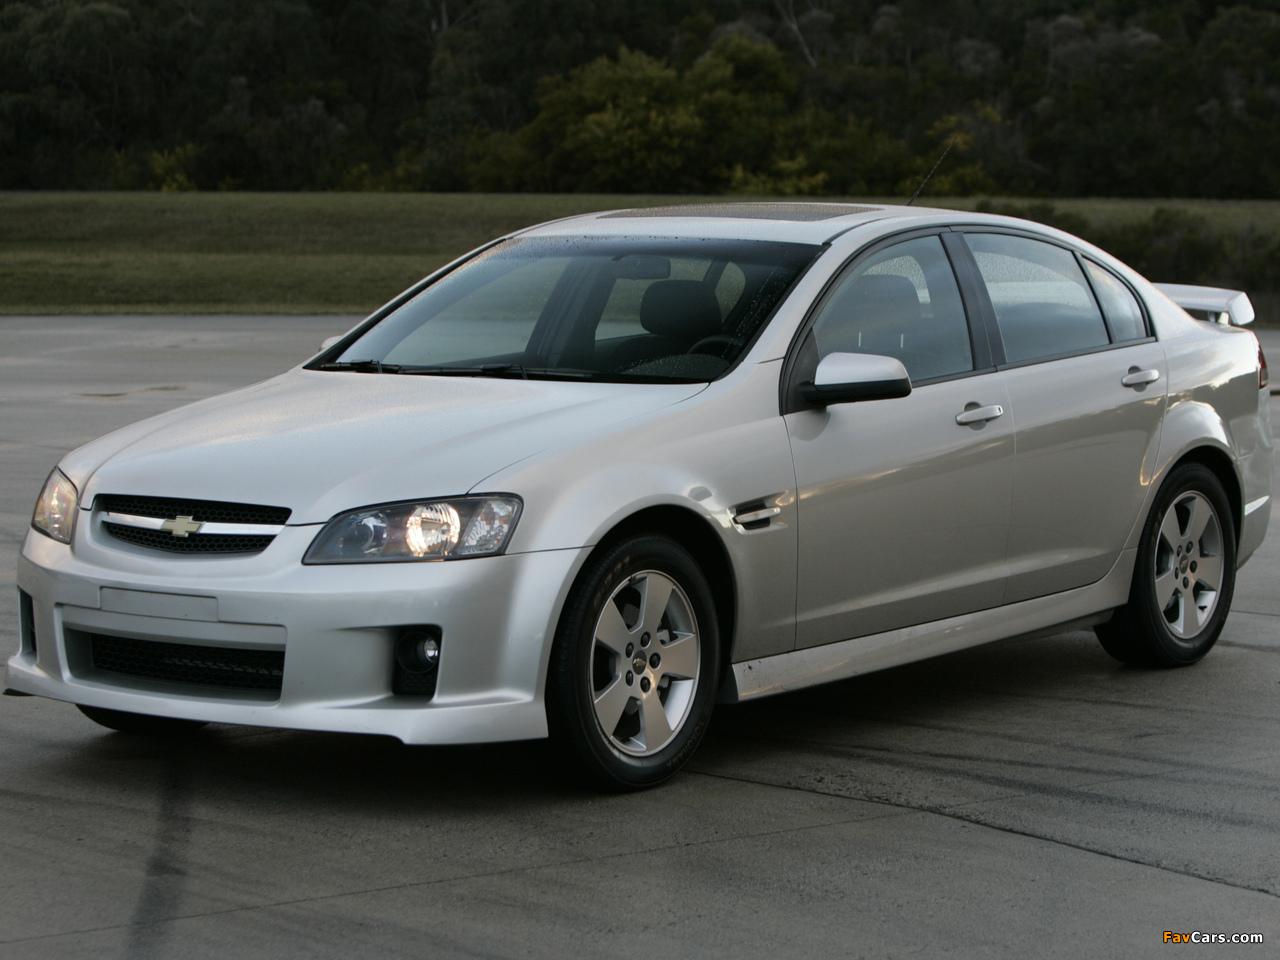 Chevrolet Lumina S 2008 photos (1280x960)